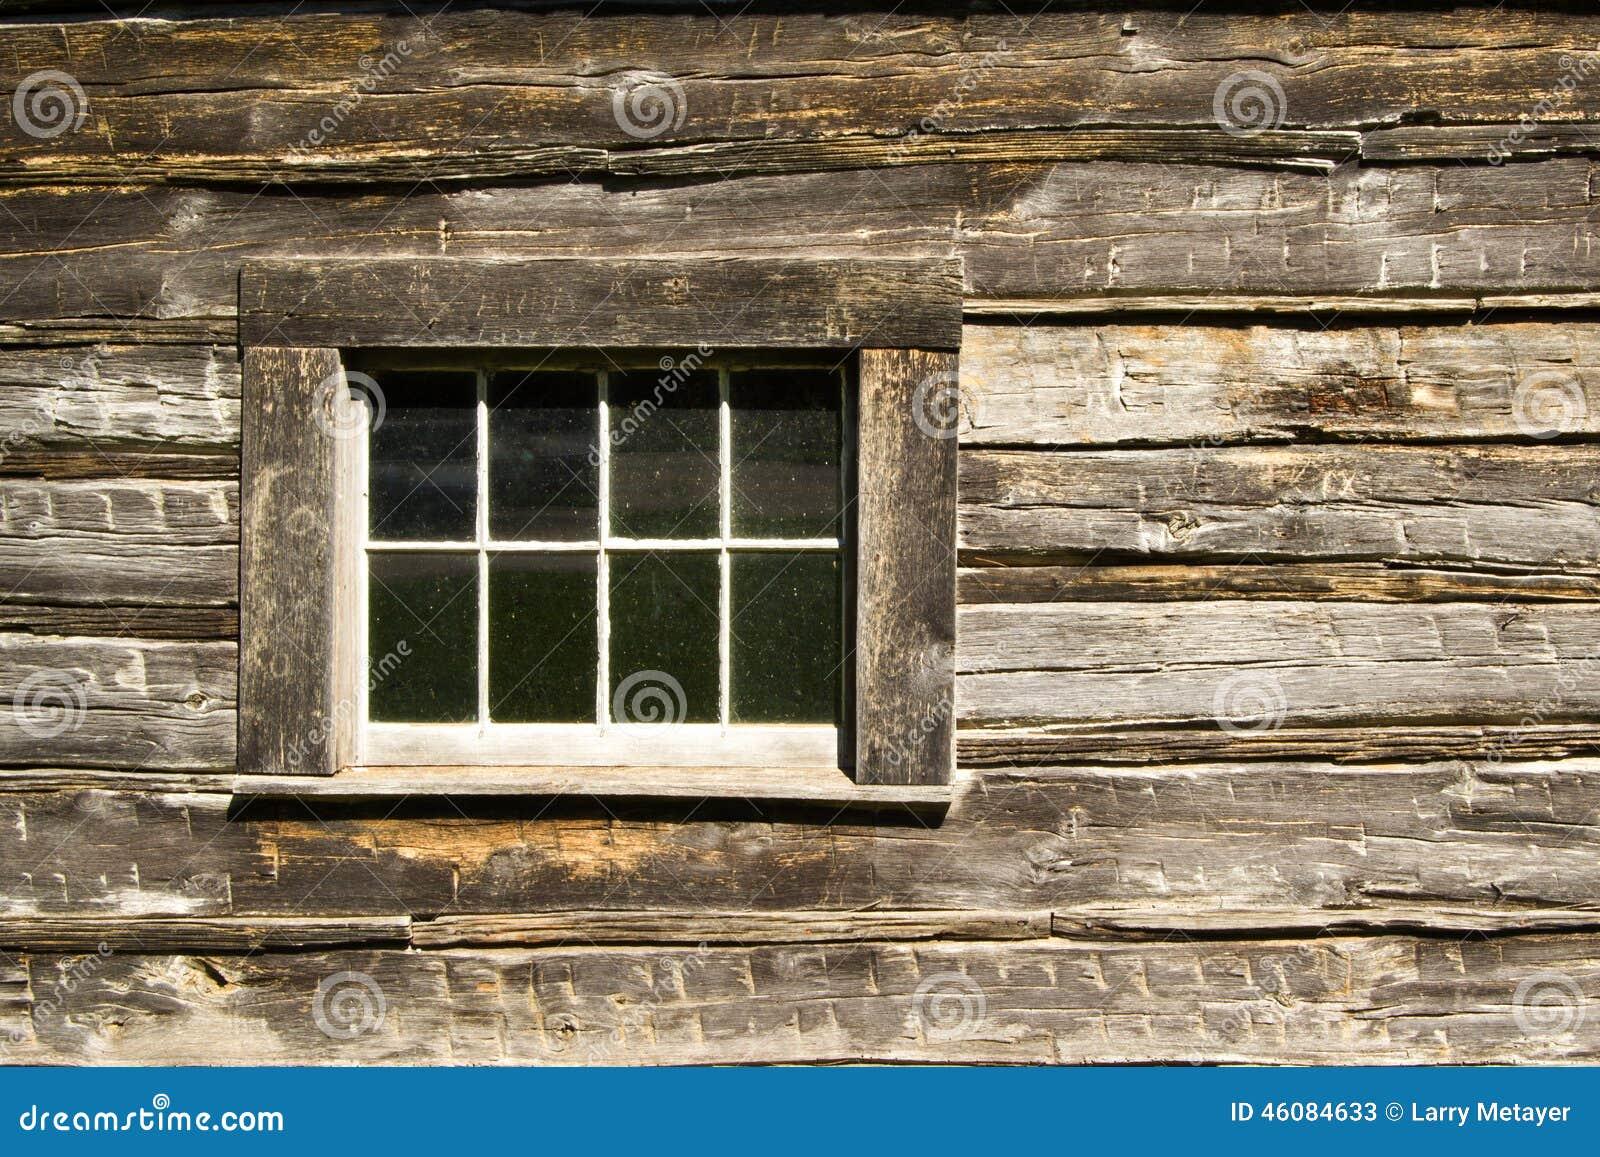 Log cabin window stock image image of history window for Log cabin window